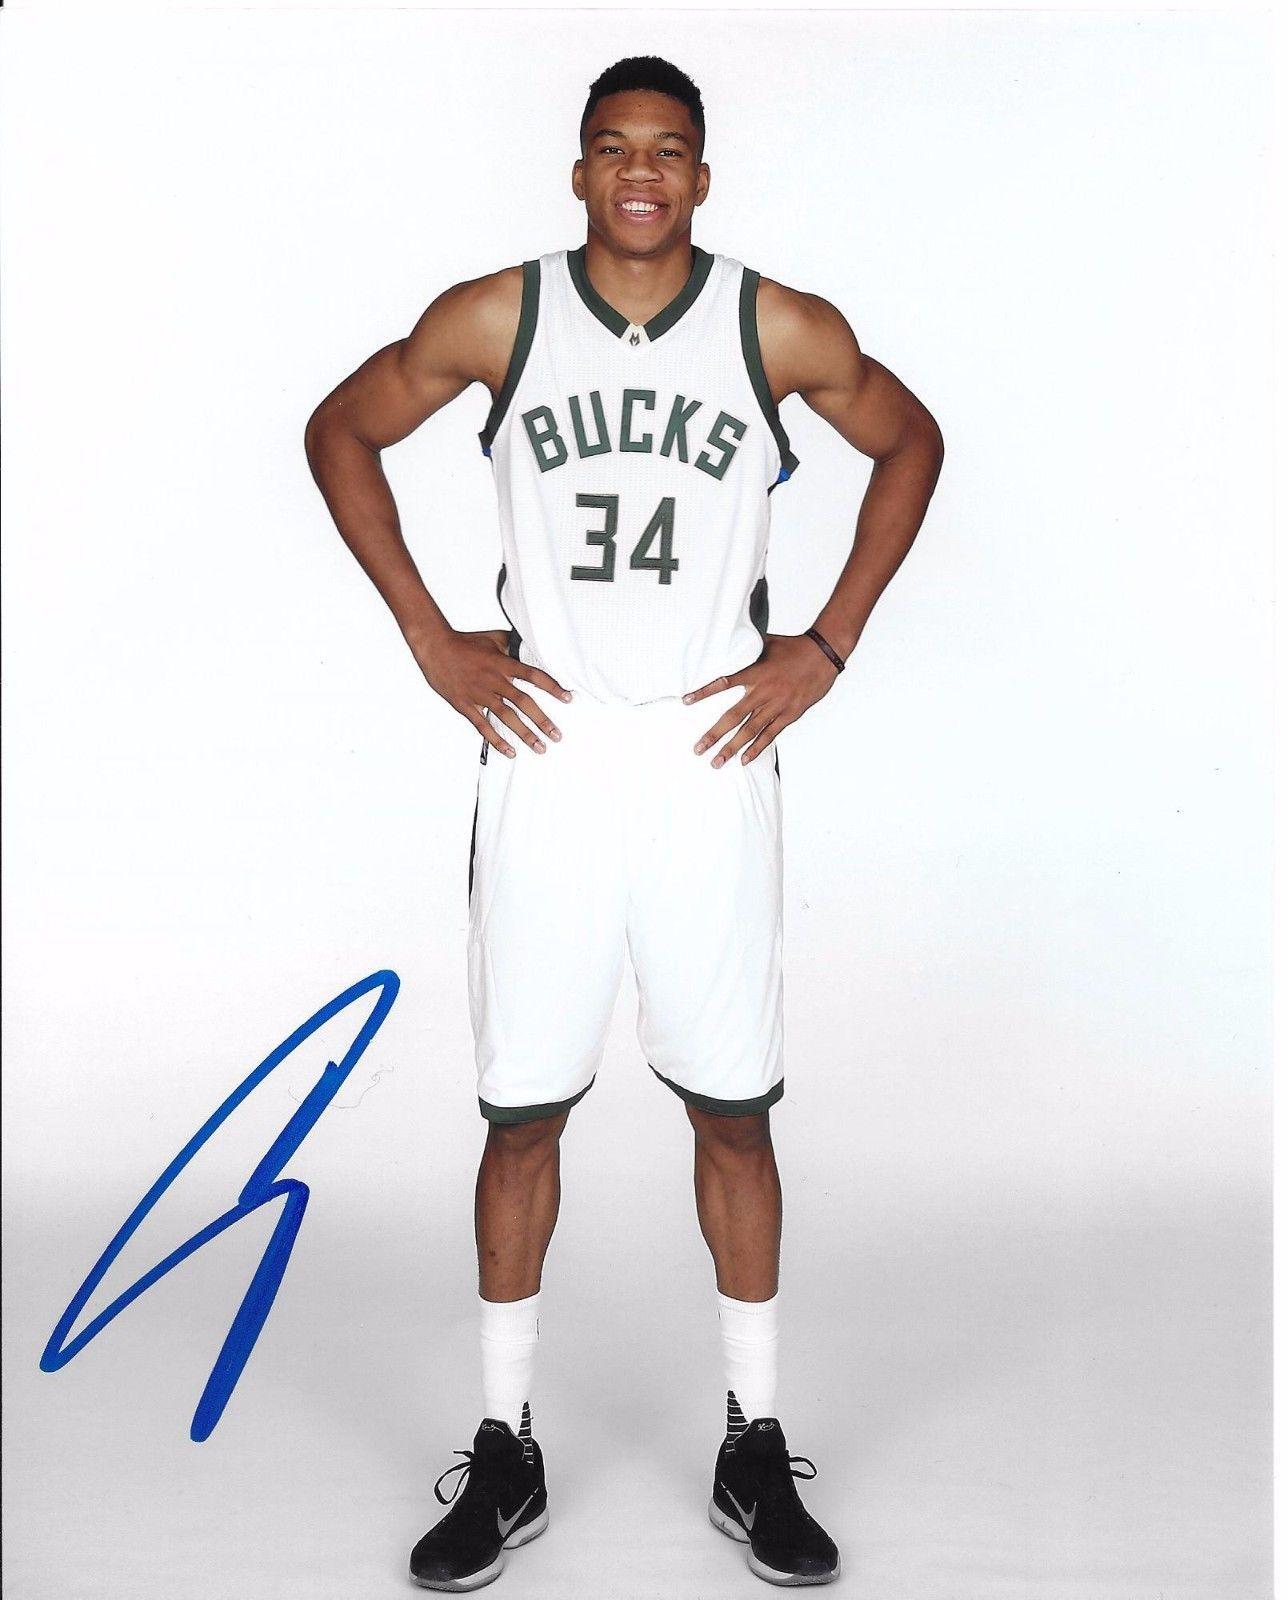 813b47dde8c Giannis Antetokounmpo Signed 8x10 Inch Photo COA Milwaukee Bucks Autograph  Auto